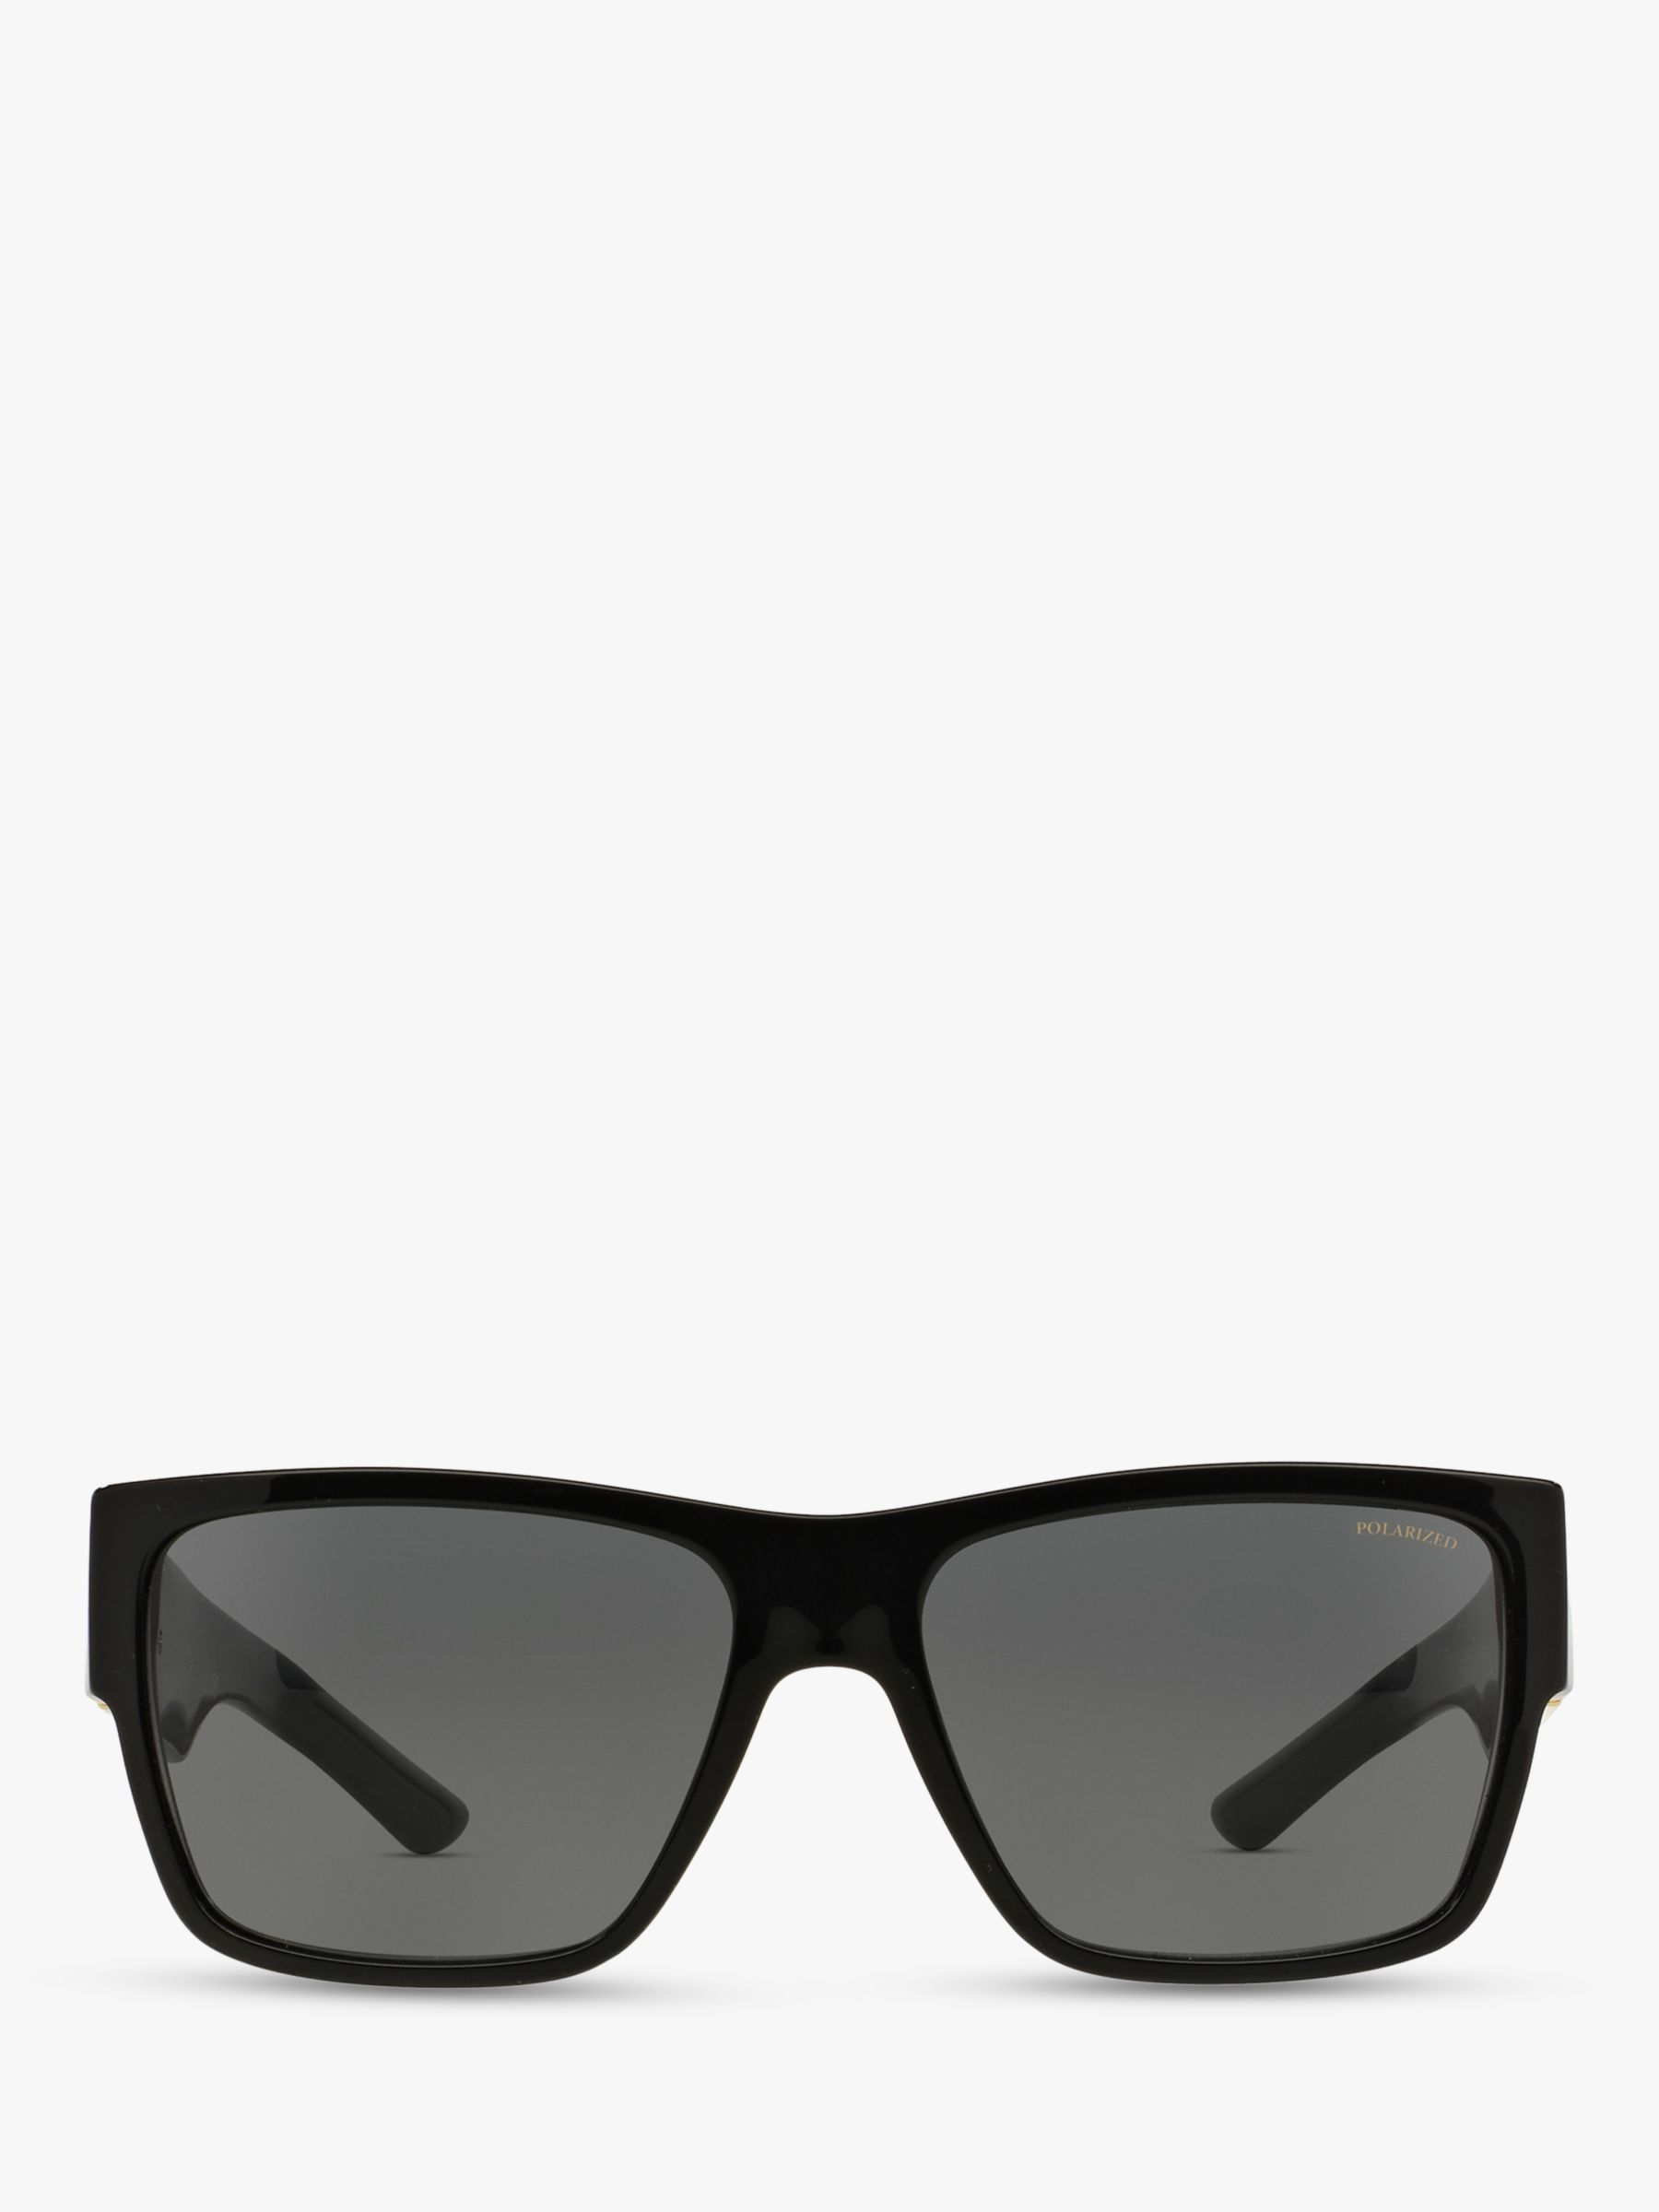 Versace VE4296 Men's Polarised Square Sunglasses, Black/Grey